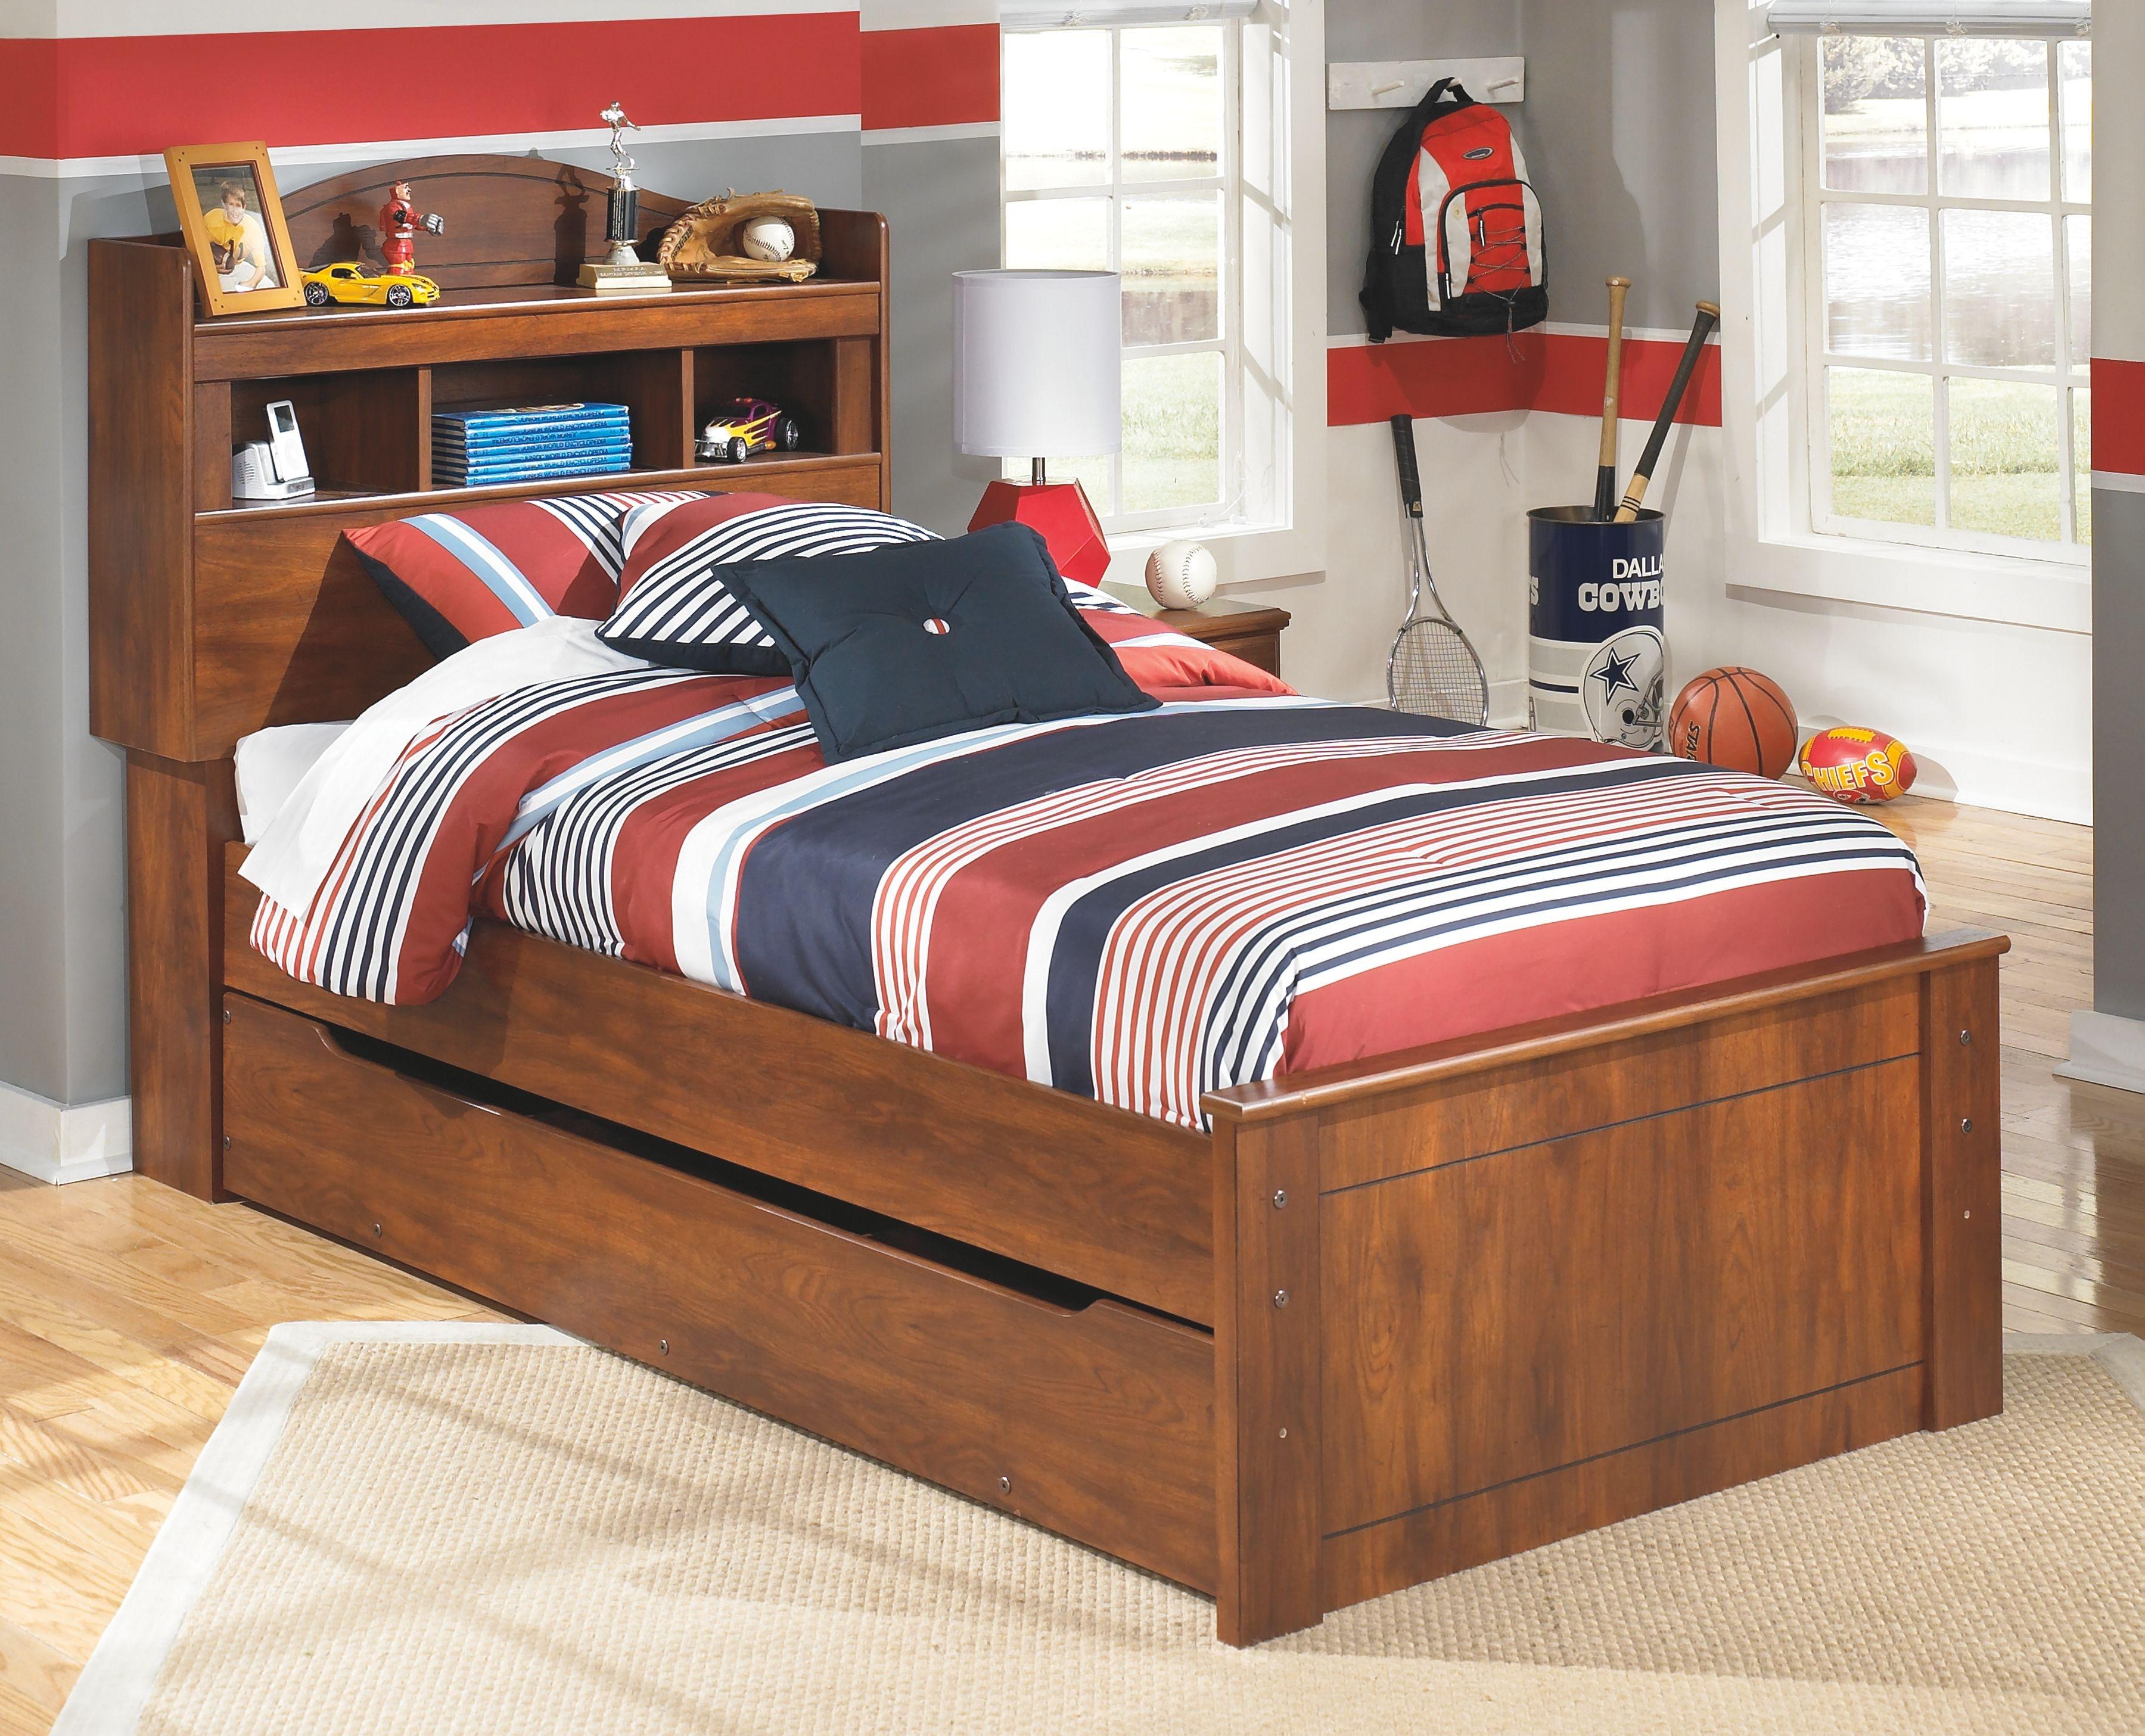 Douds Furniture